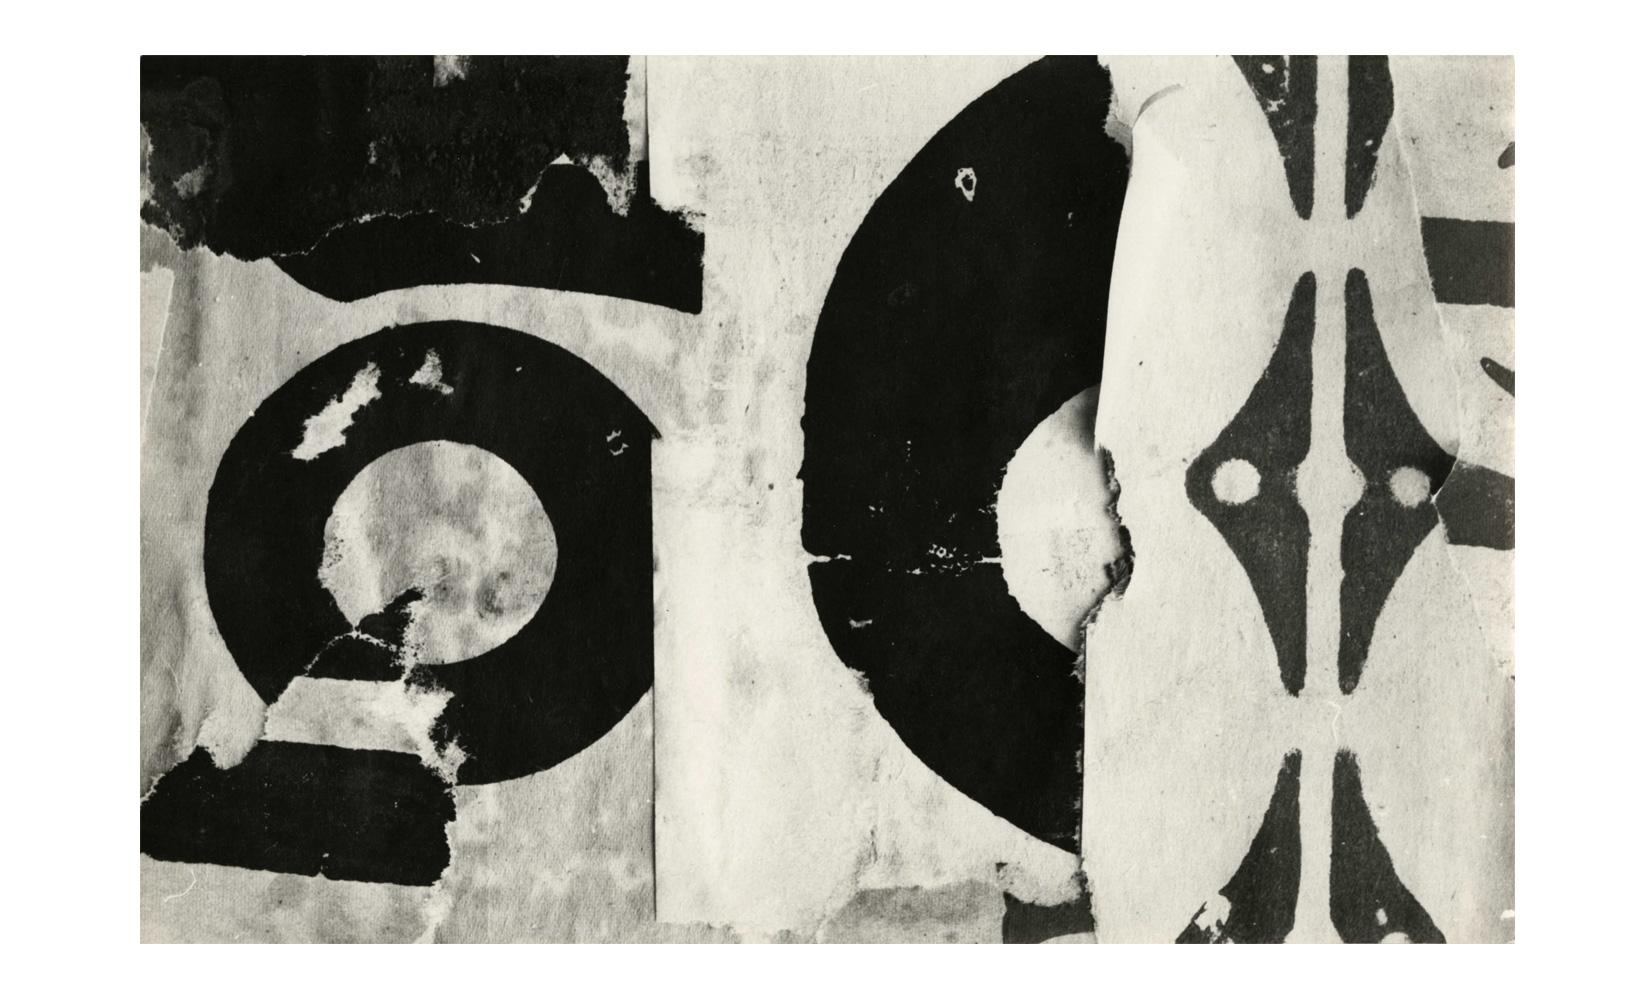 TOLUCA-FINE-ART-SERGIO-TRUJILLO-02.jpg